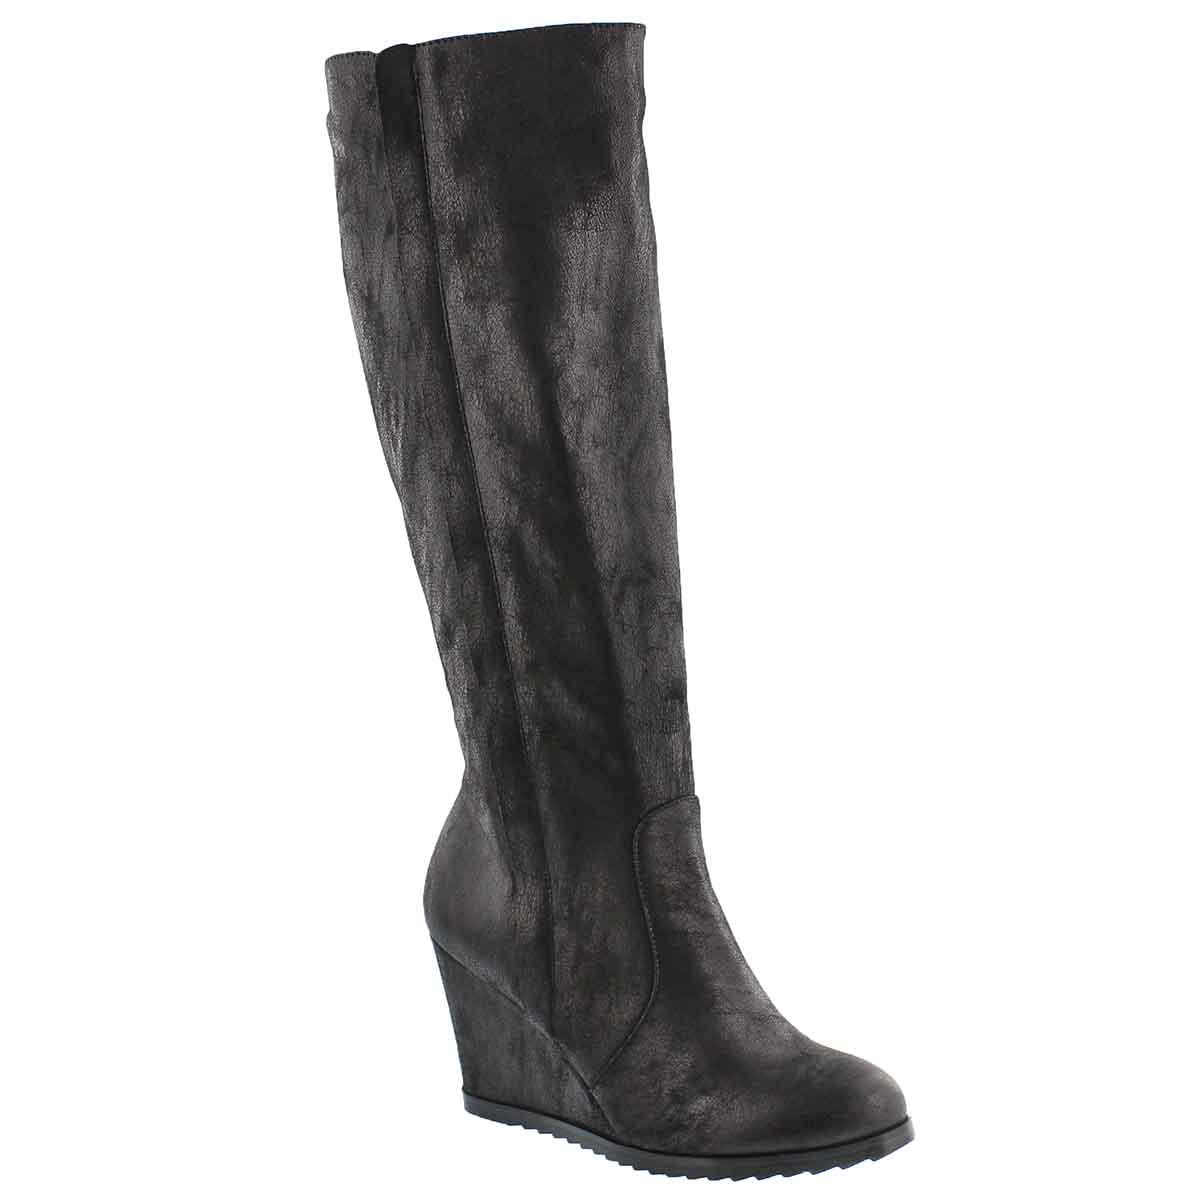 Lds Blondie Mid blk knee high wedge boot